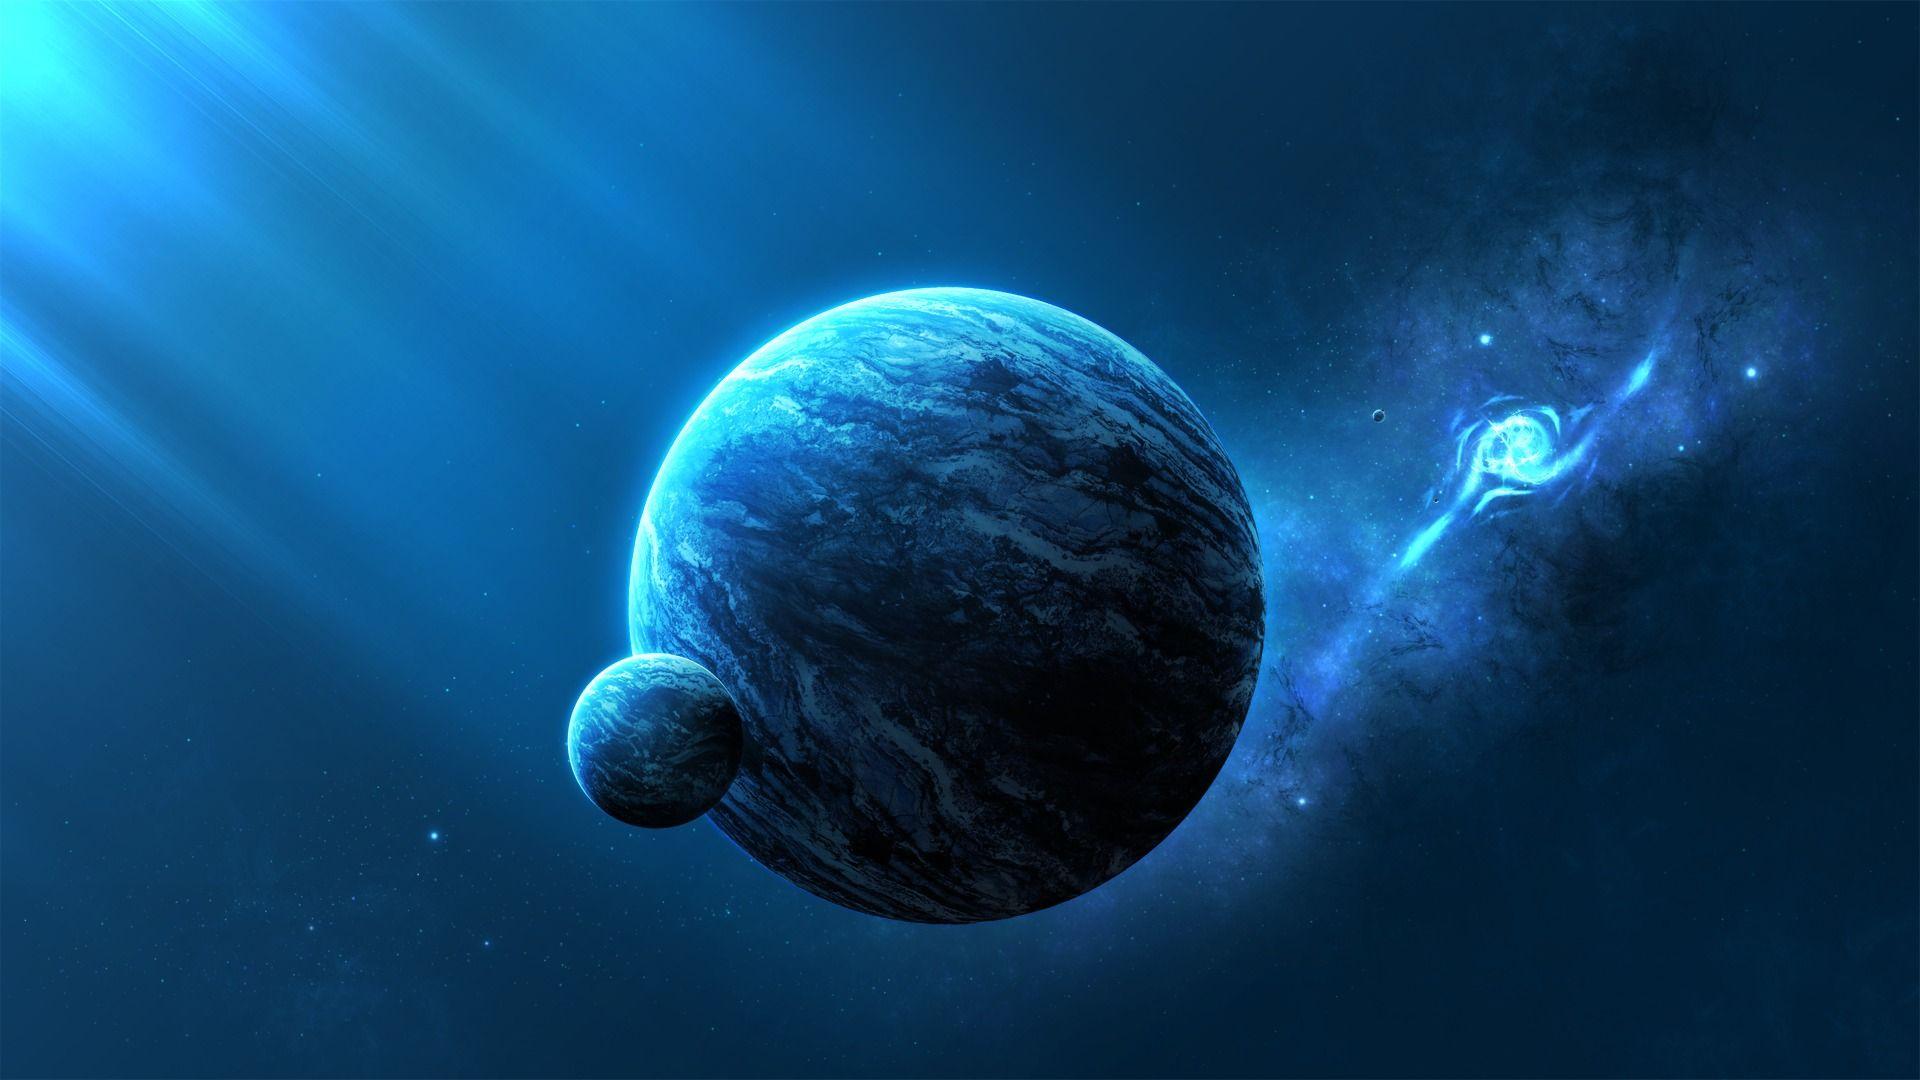 Shiva Live Wallpapers Hd Hd Wallpaper Space Space Moon Nebula Planet